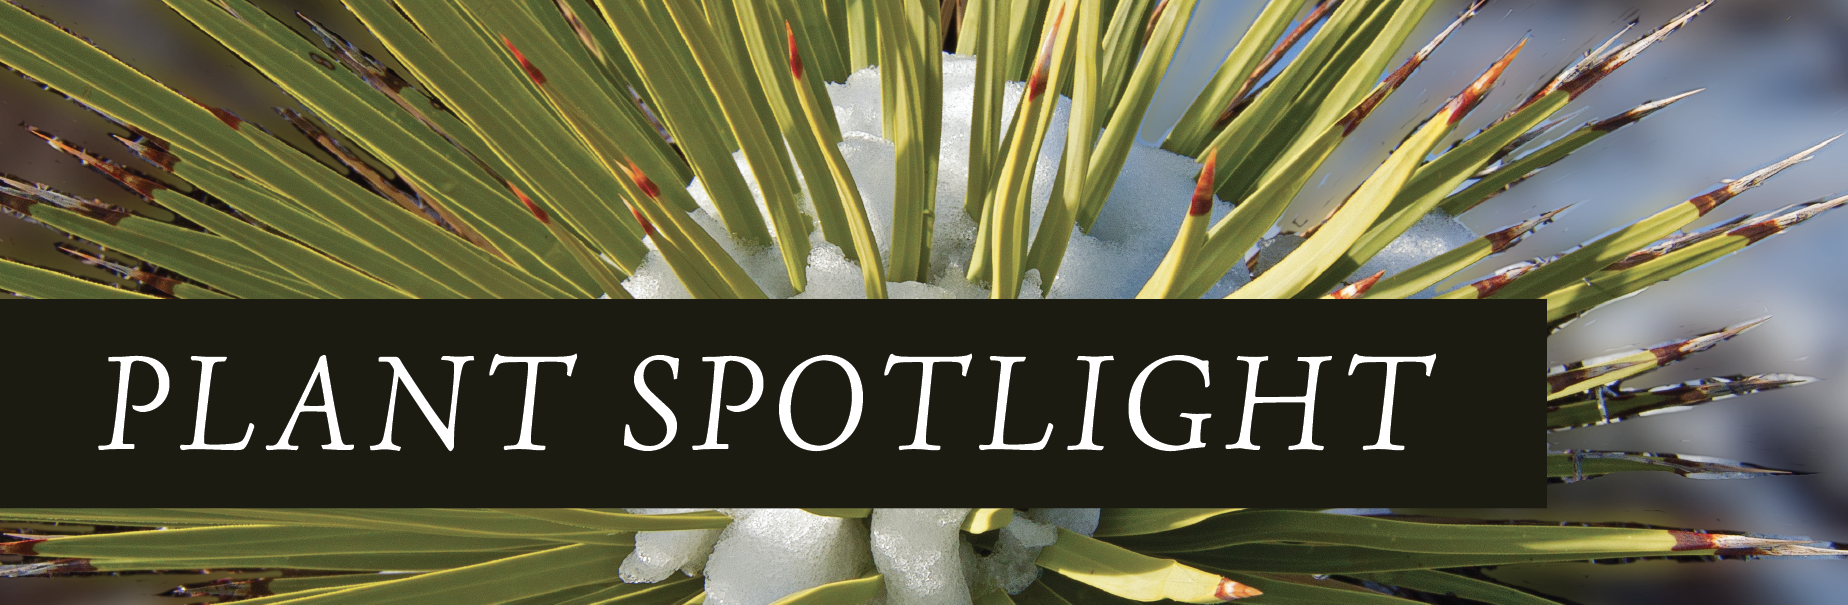 """plant spotlight"" graphic"